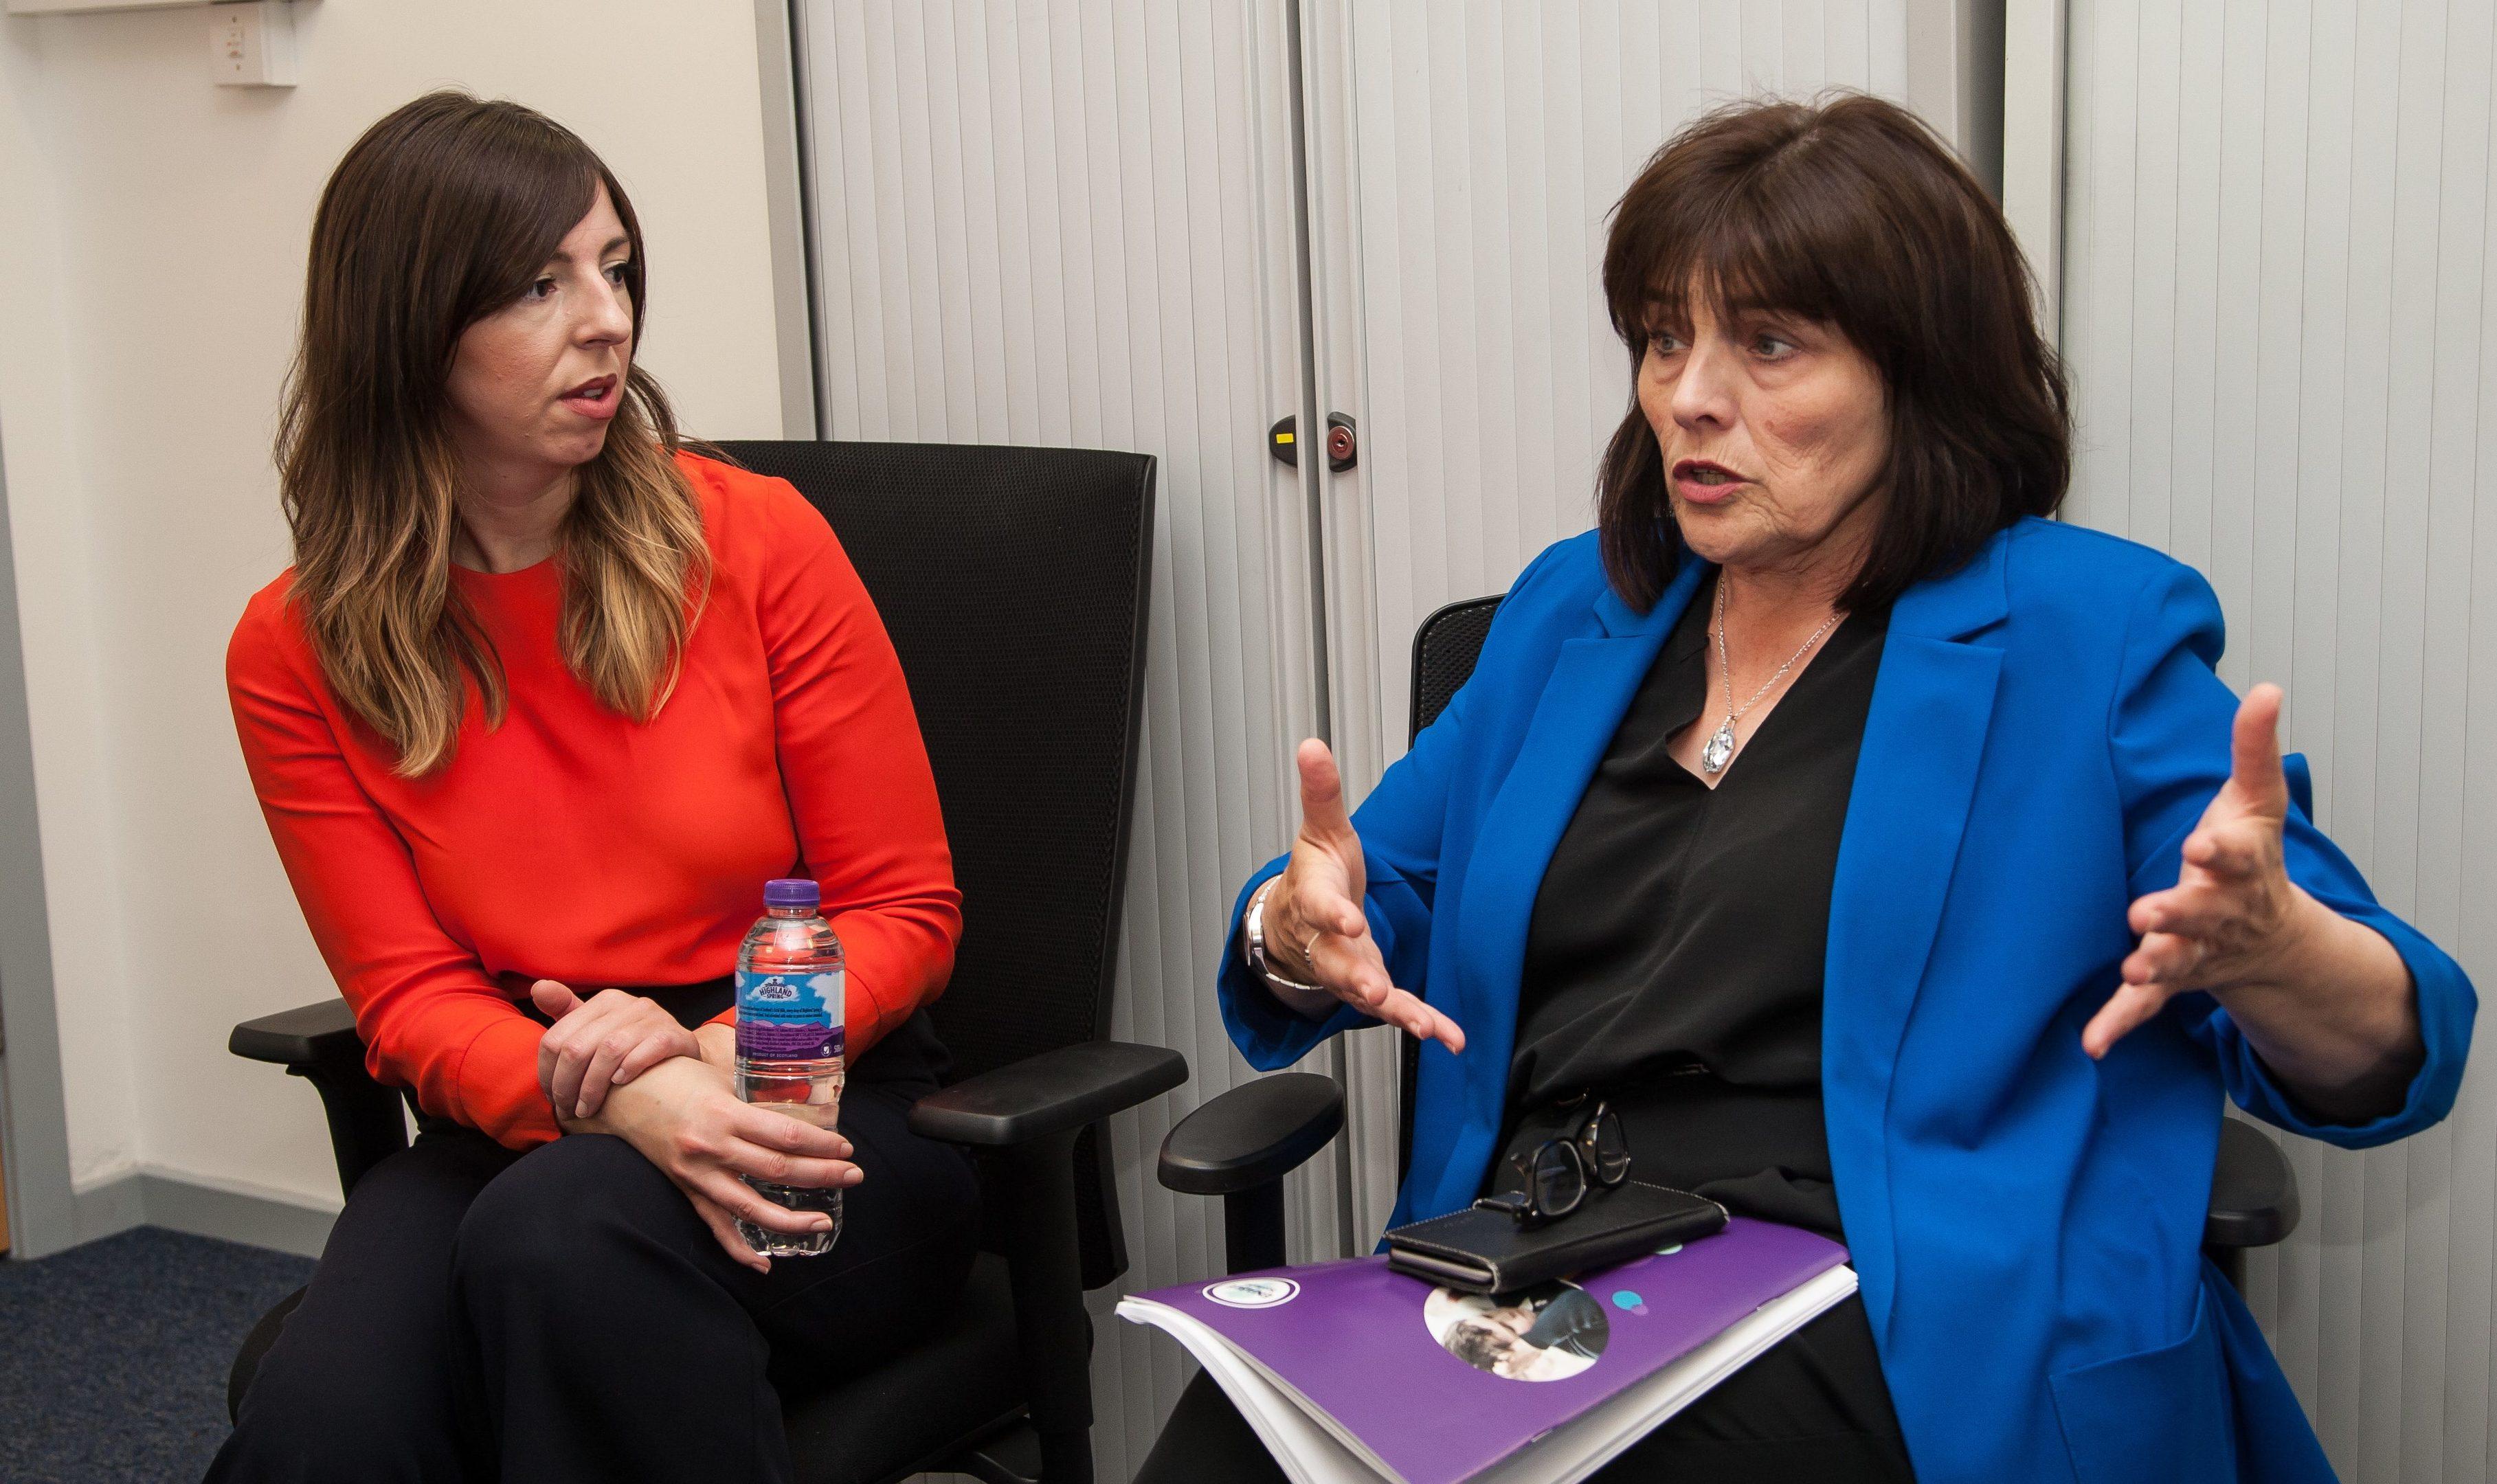 ENABLE Scotland executive director Jan Savage talks to Jeane Freeman